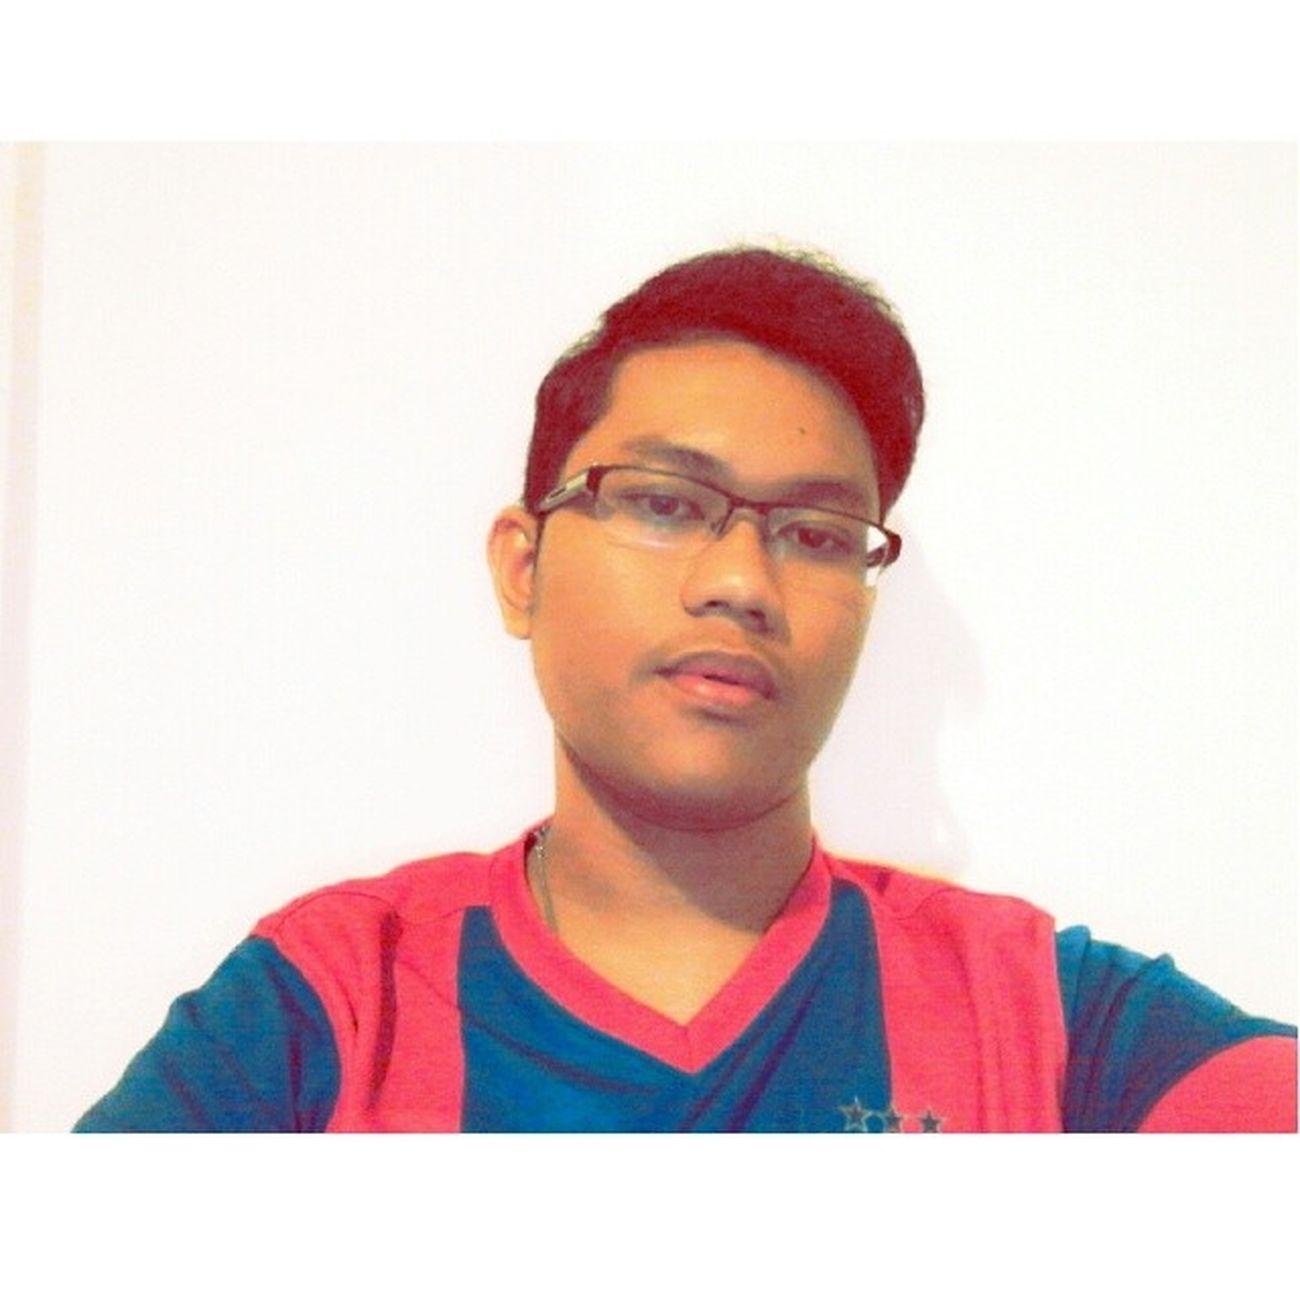 Selfie Boring Tb Instasize MornightSelfie JDT